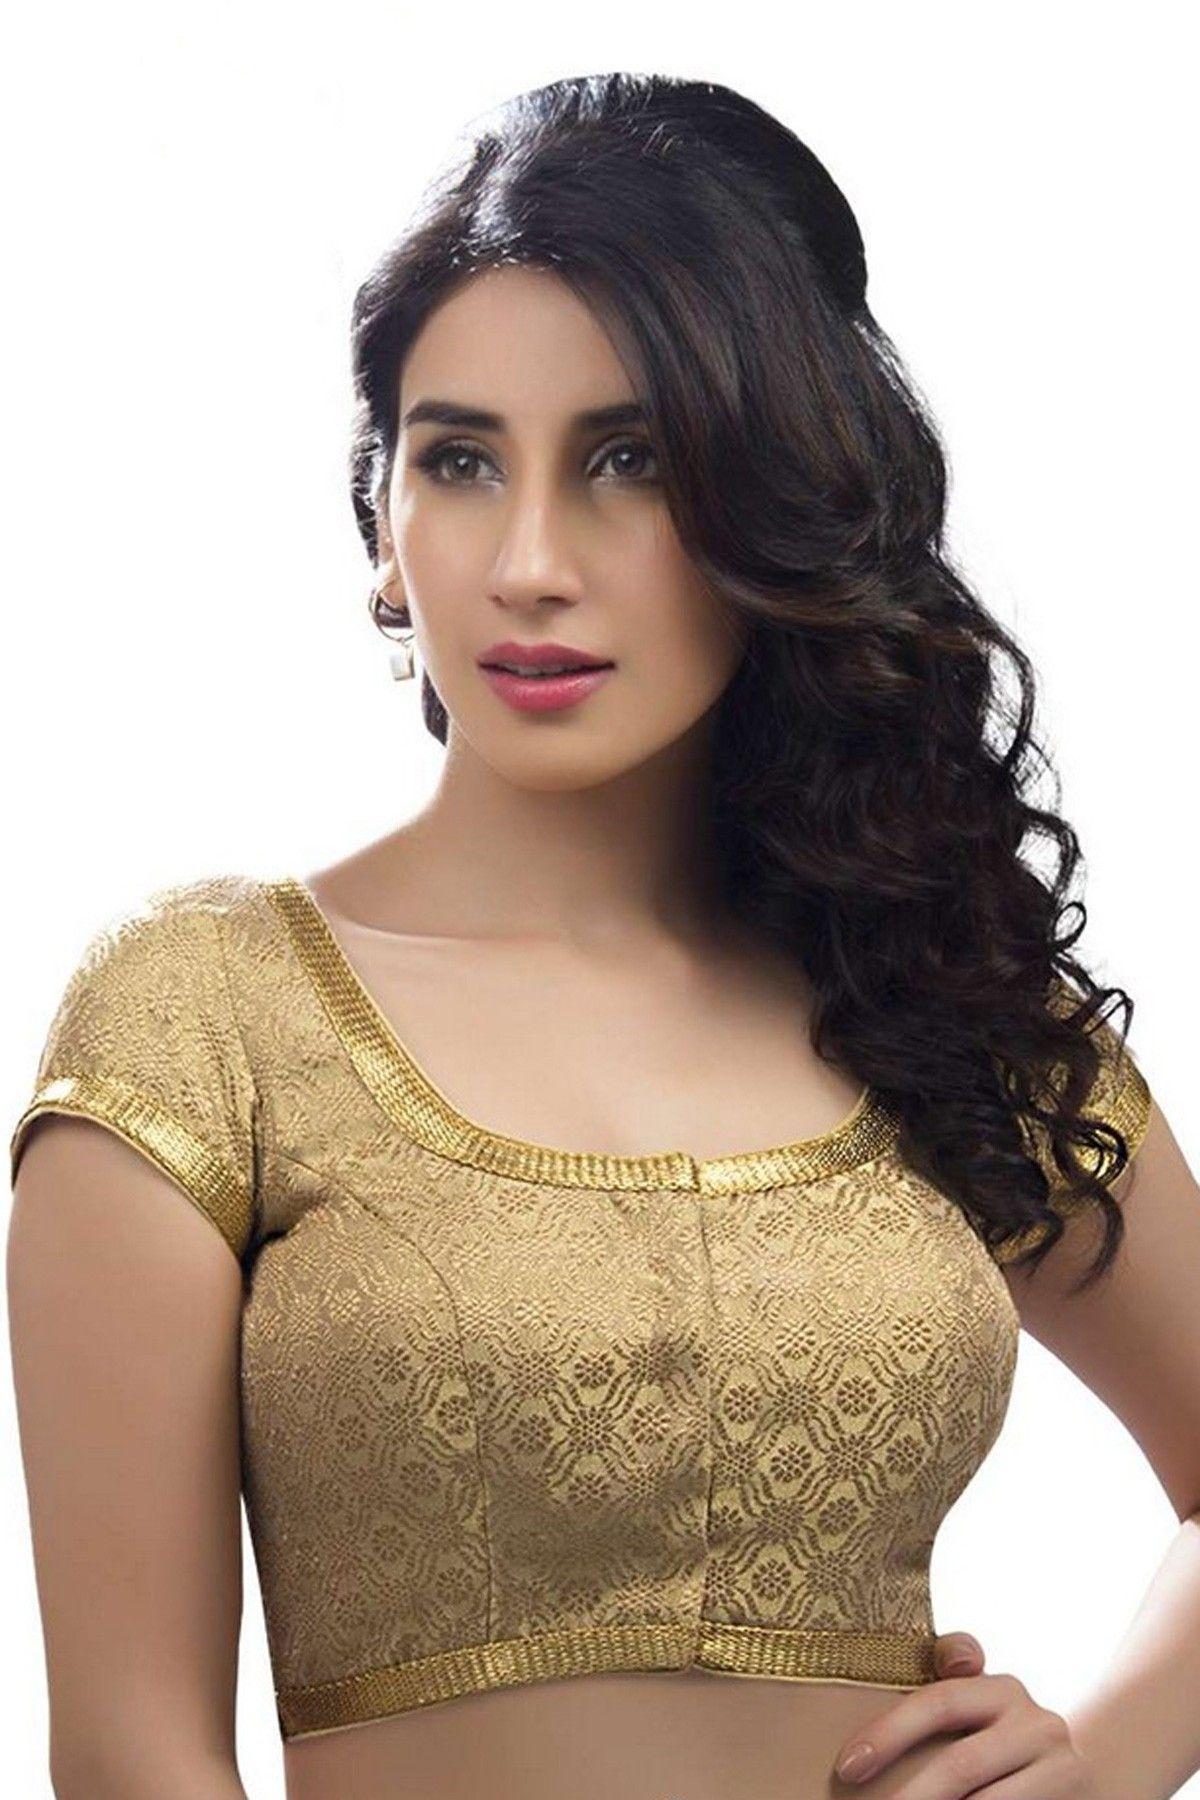 e92a769a7b4459 Light gold festive wear banarasi self embossed blouse with cap sleeves  -BL698 | designer blouse online india | #goldenblouse #festive #wears  #womens #cloth